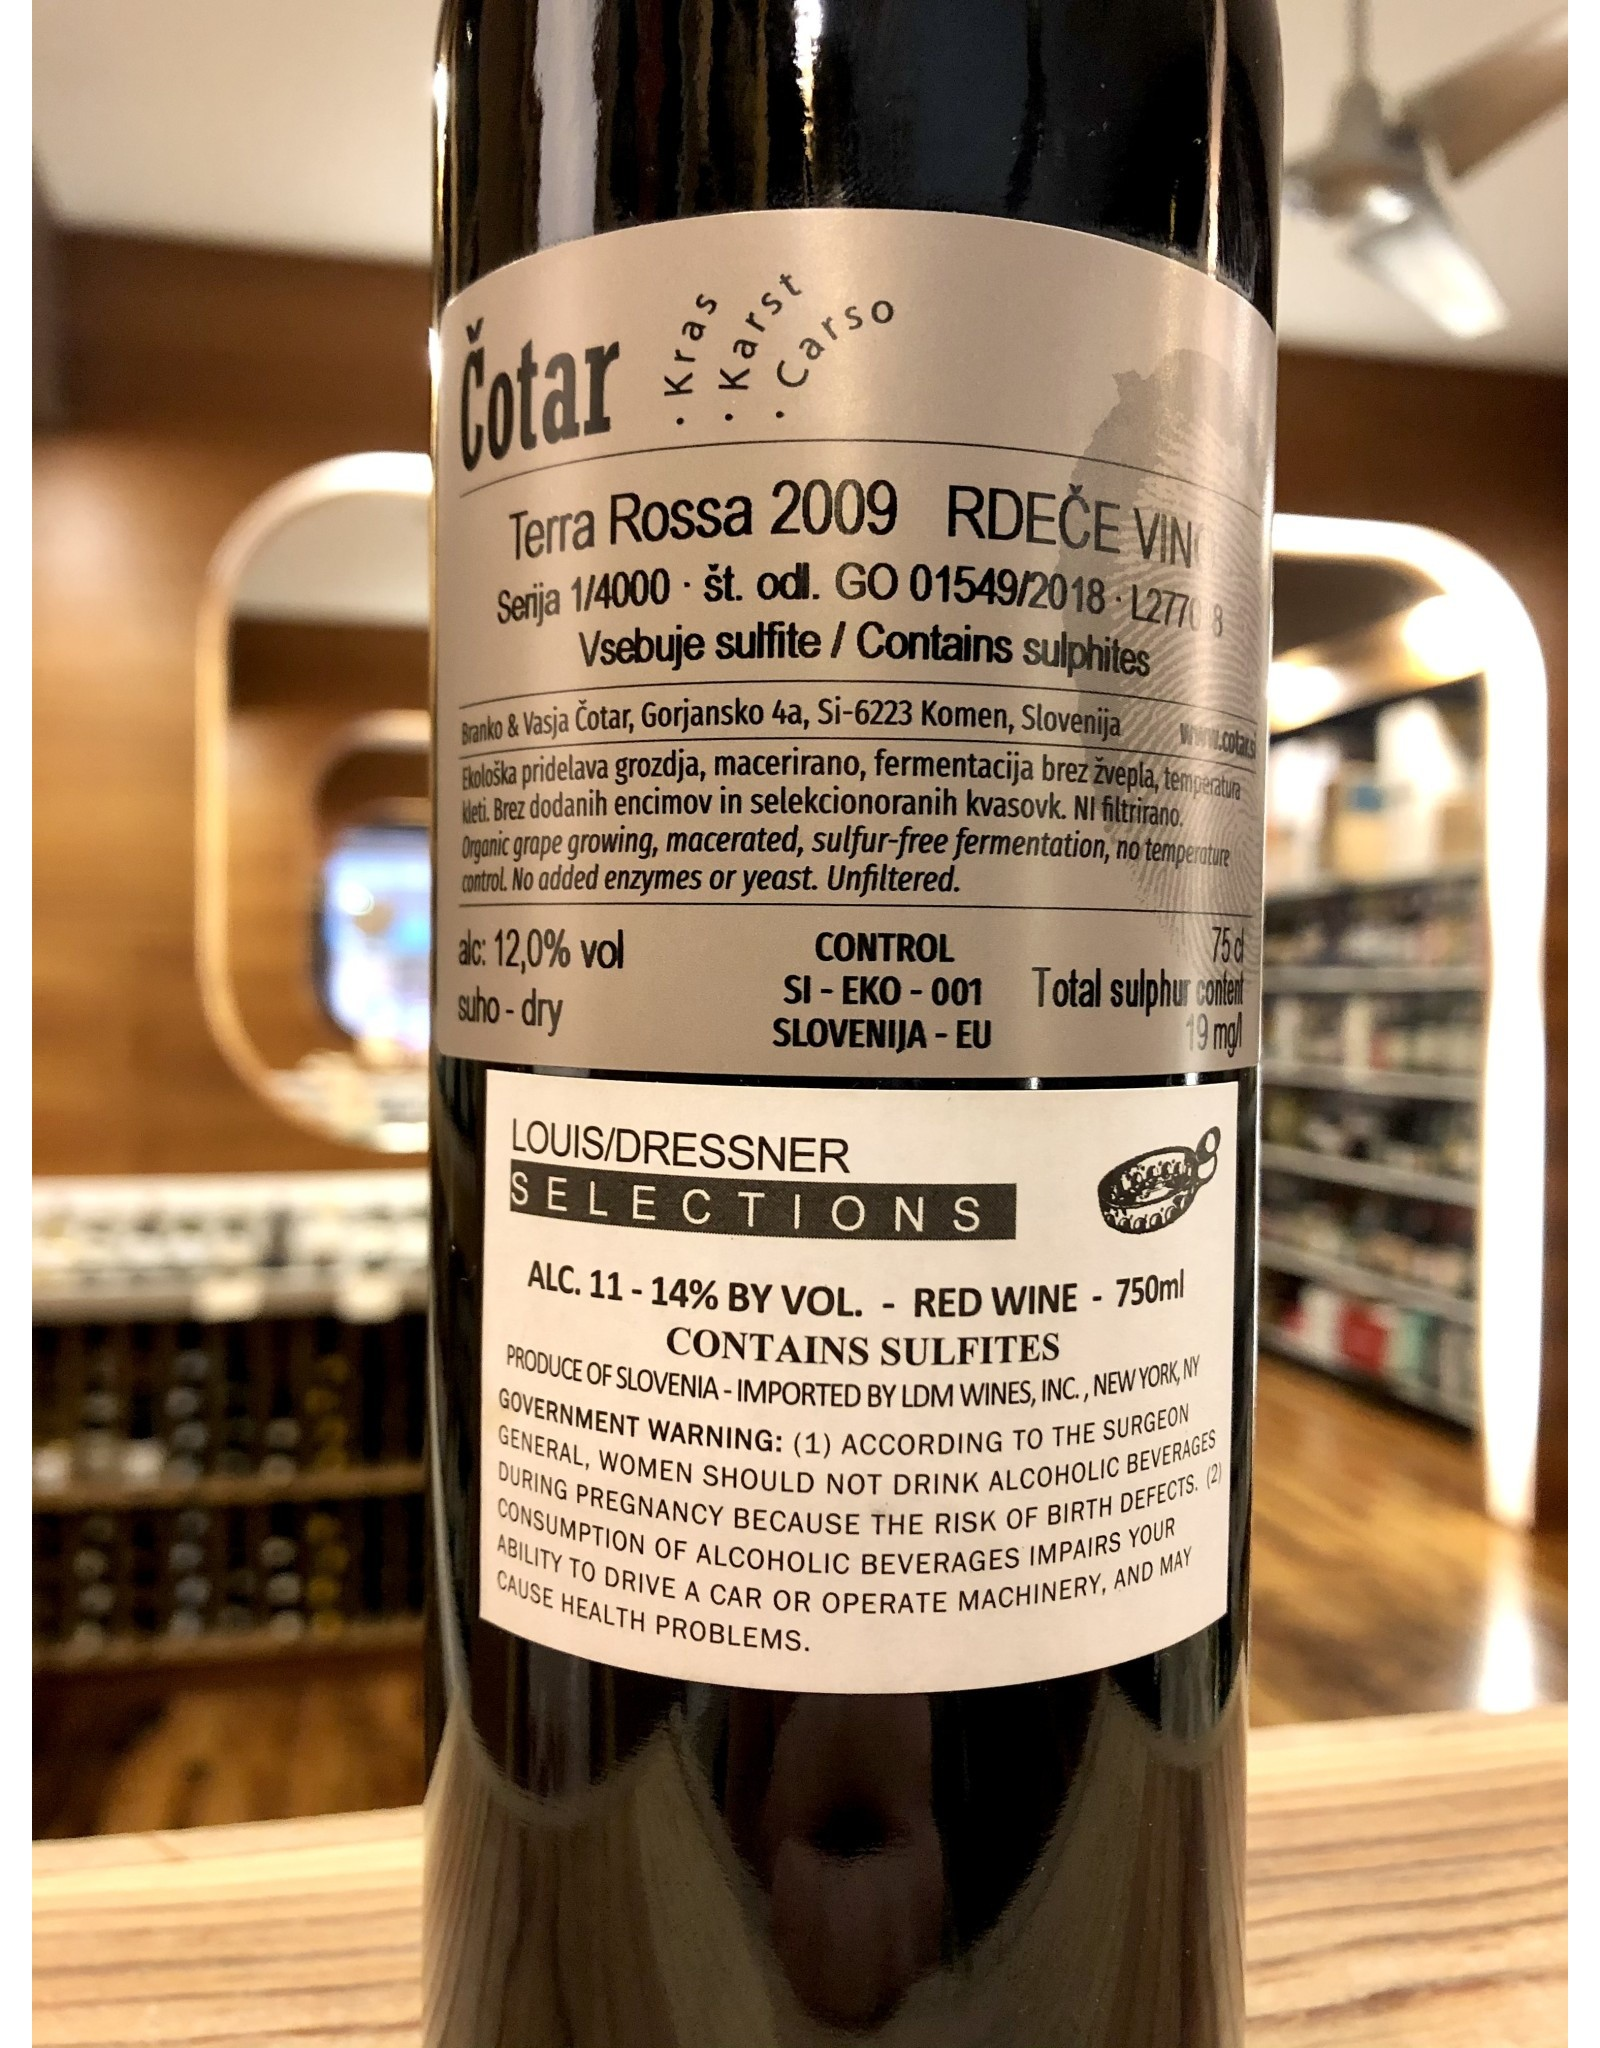 Cotar Terra Rossa 2009 - 750 ML